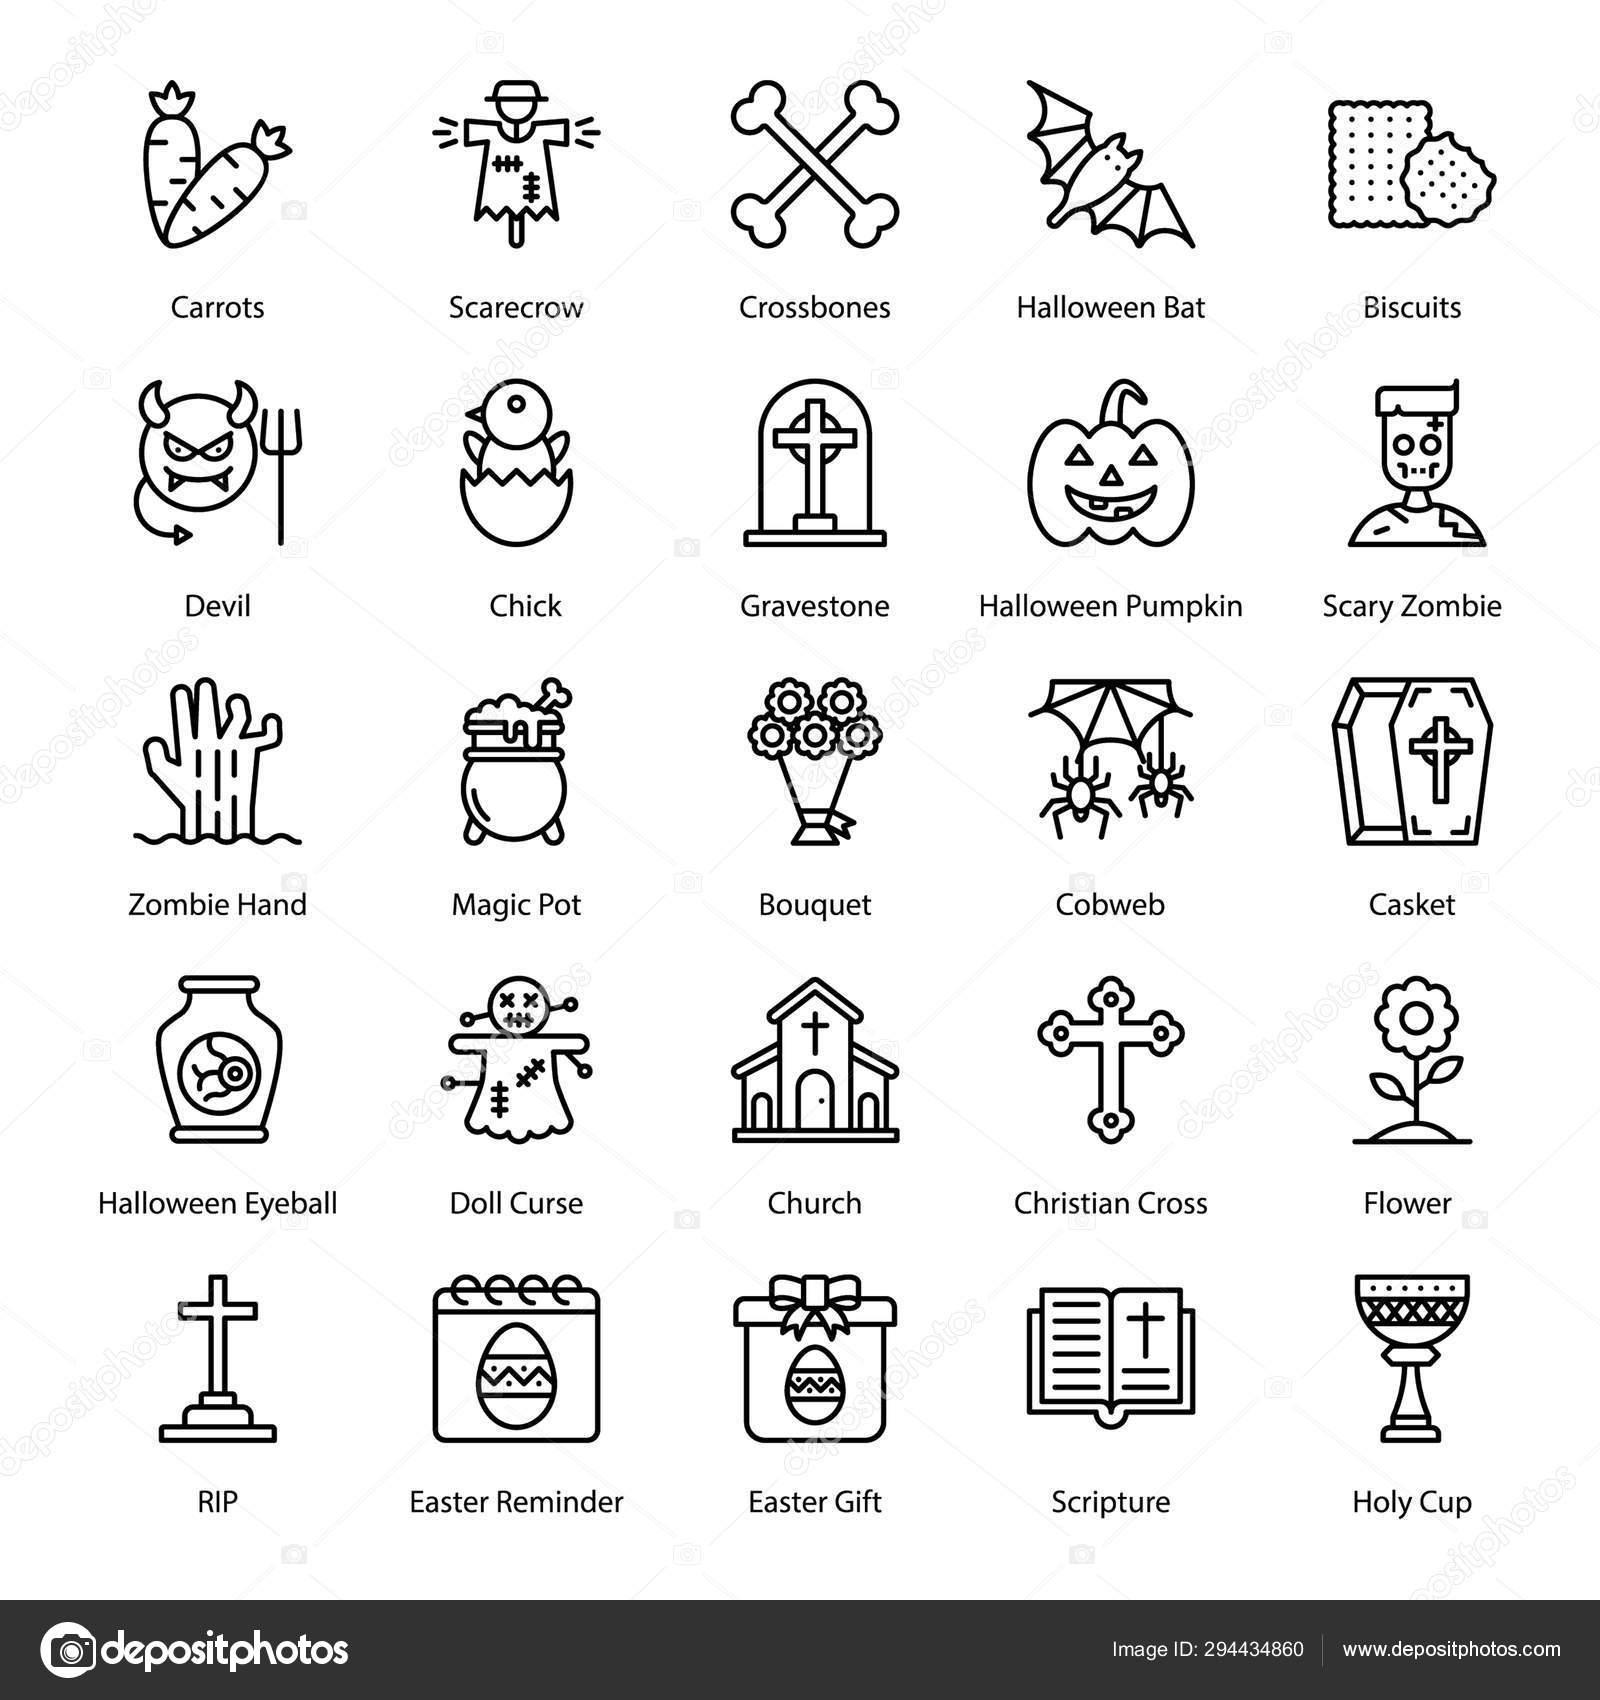 Here Set Hobbies Icon Line Design Just Grab Editable Pack Stock Vector C Vectorspoint 294434860